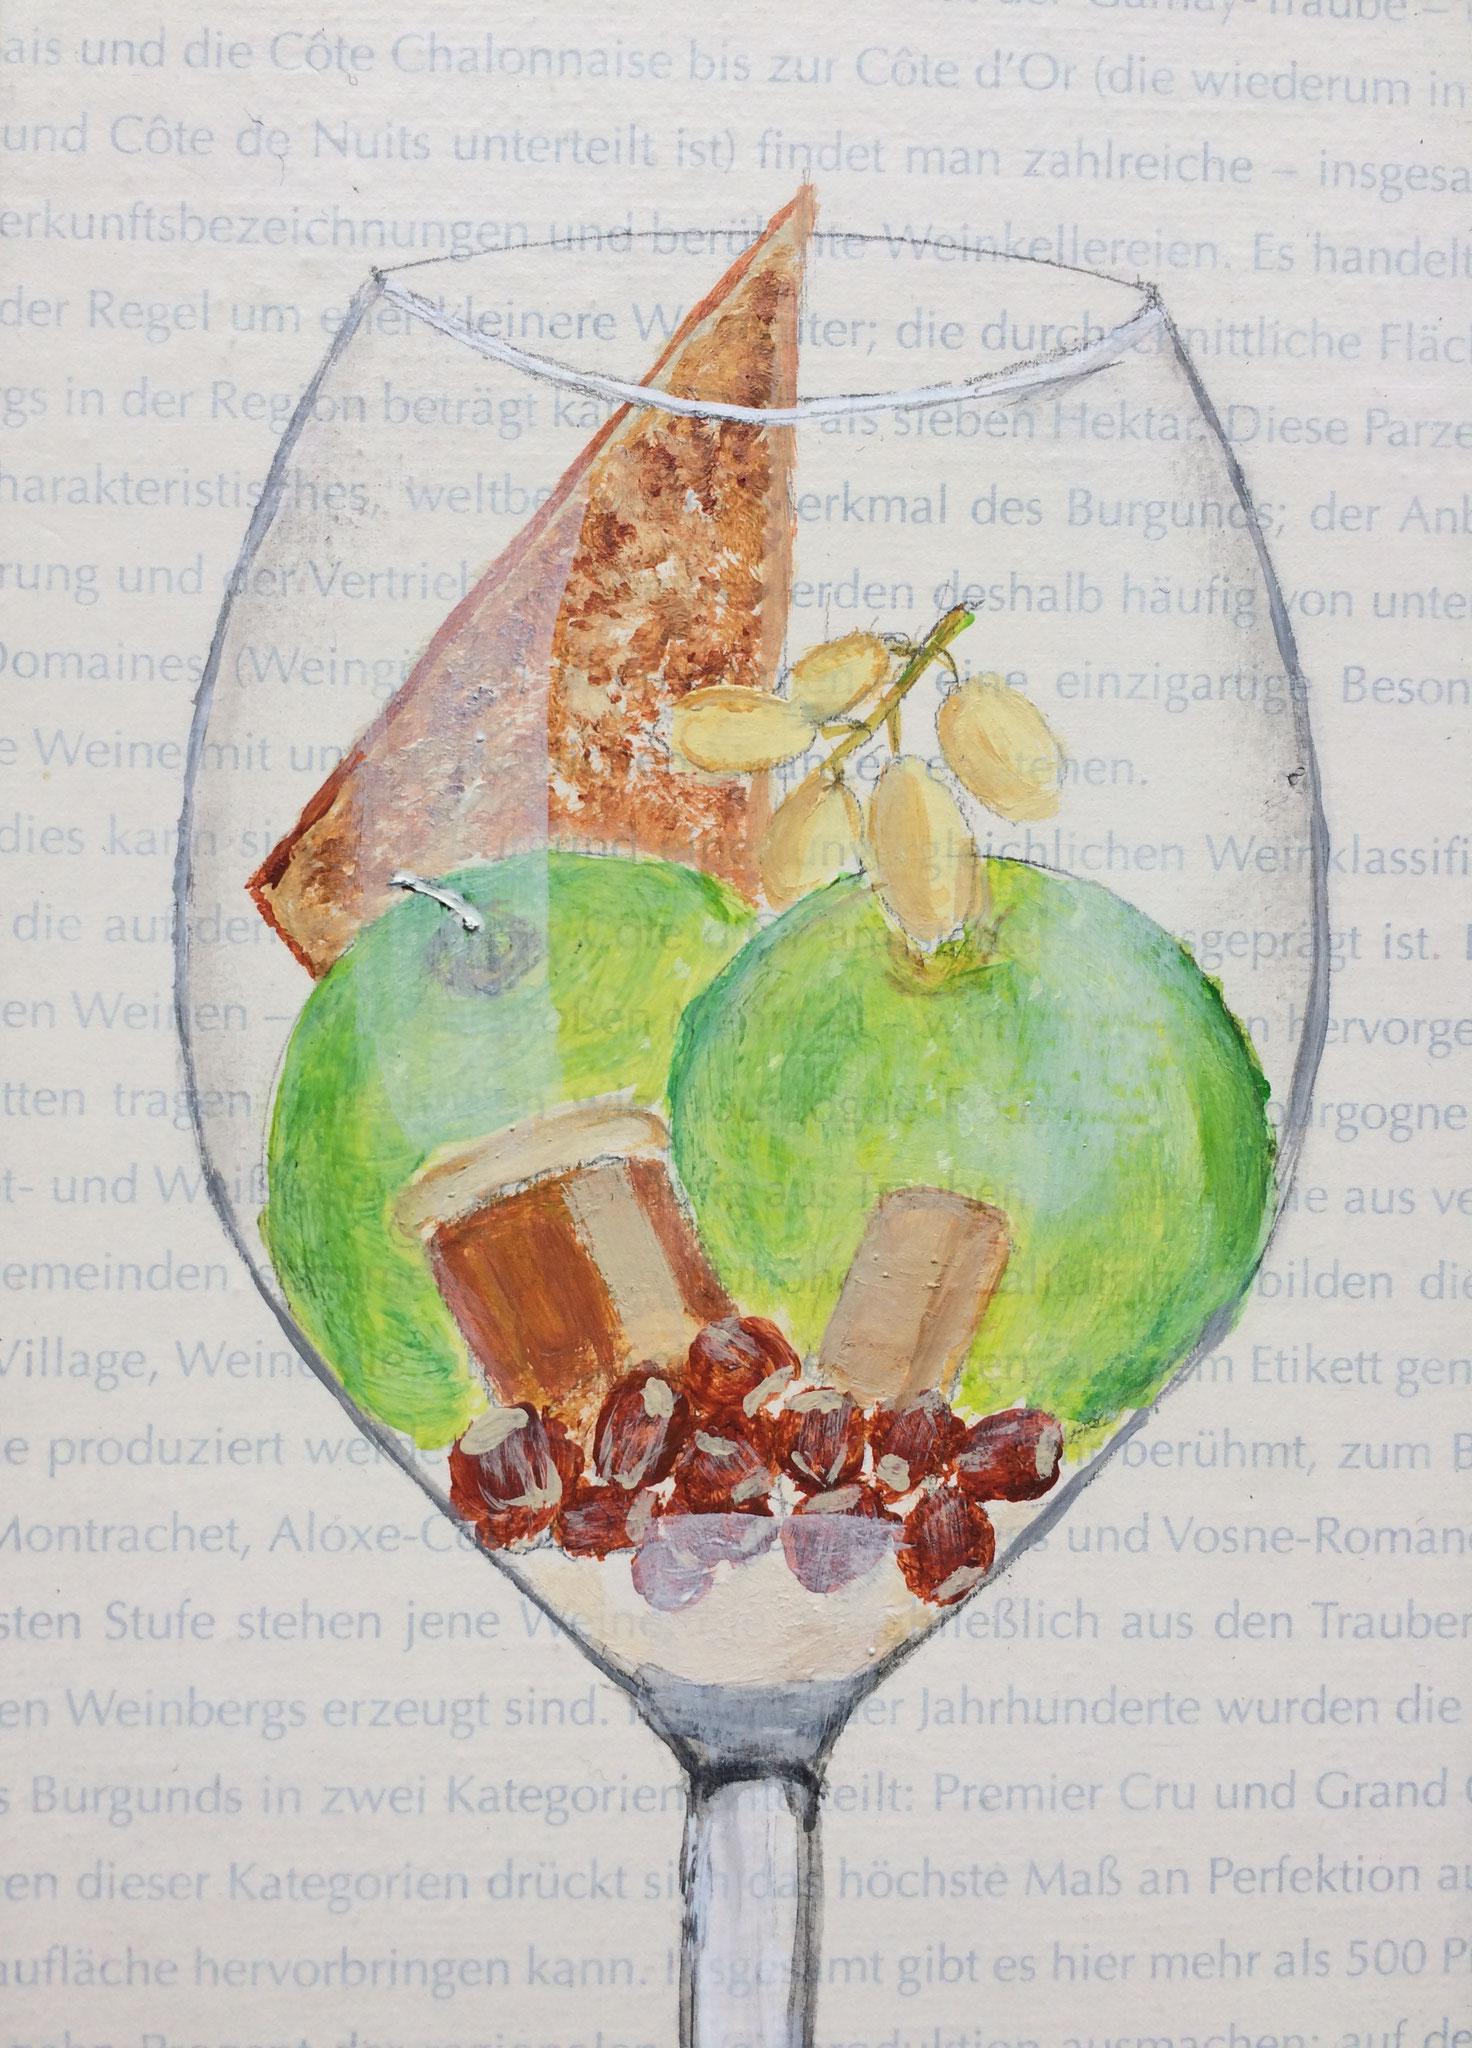 Puligny: Chardonnay